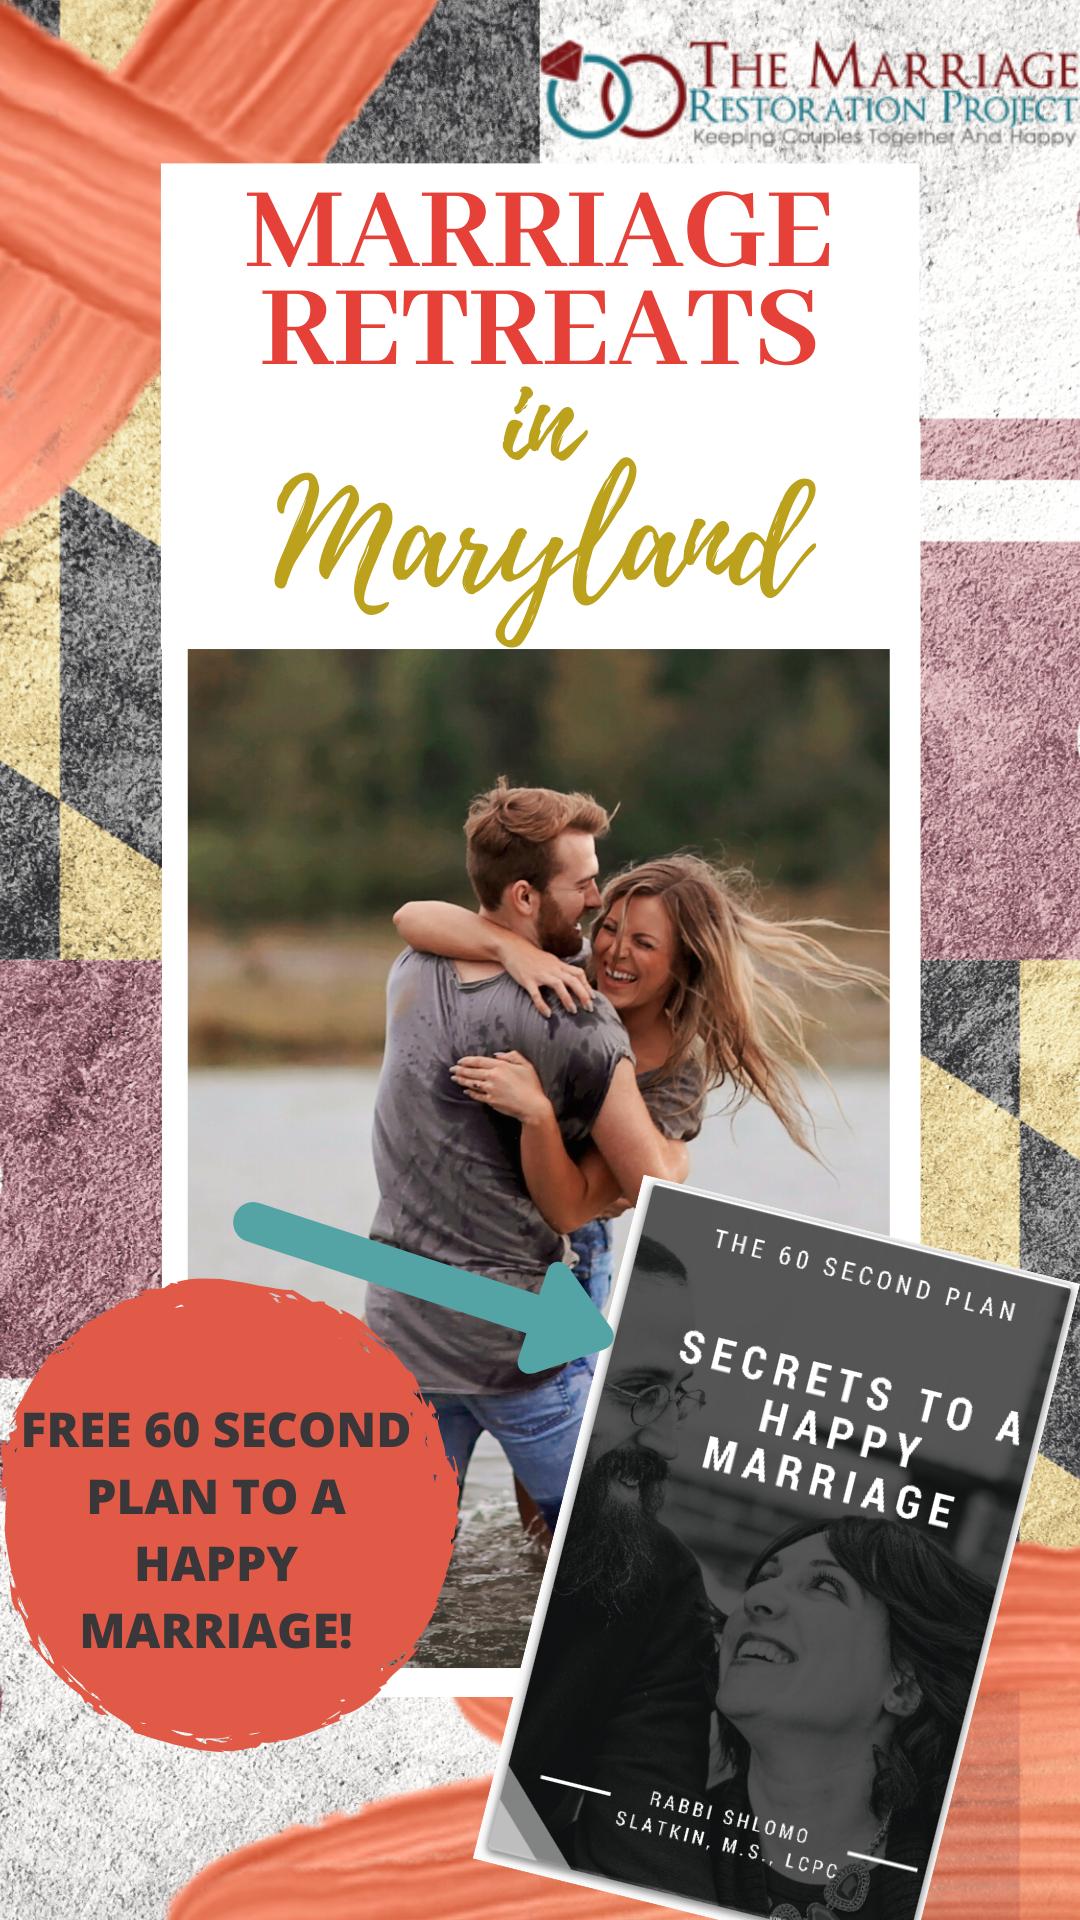 Intensive Marriage Retreats Online 2 Day Imago Therapy Weekend Retreat In 2020 Marriage Retreats Marriage Restoration Happy Marriage